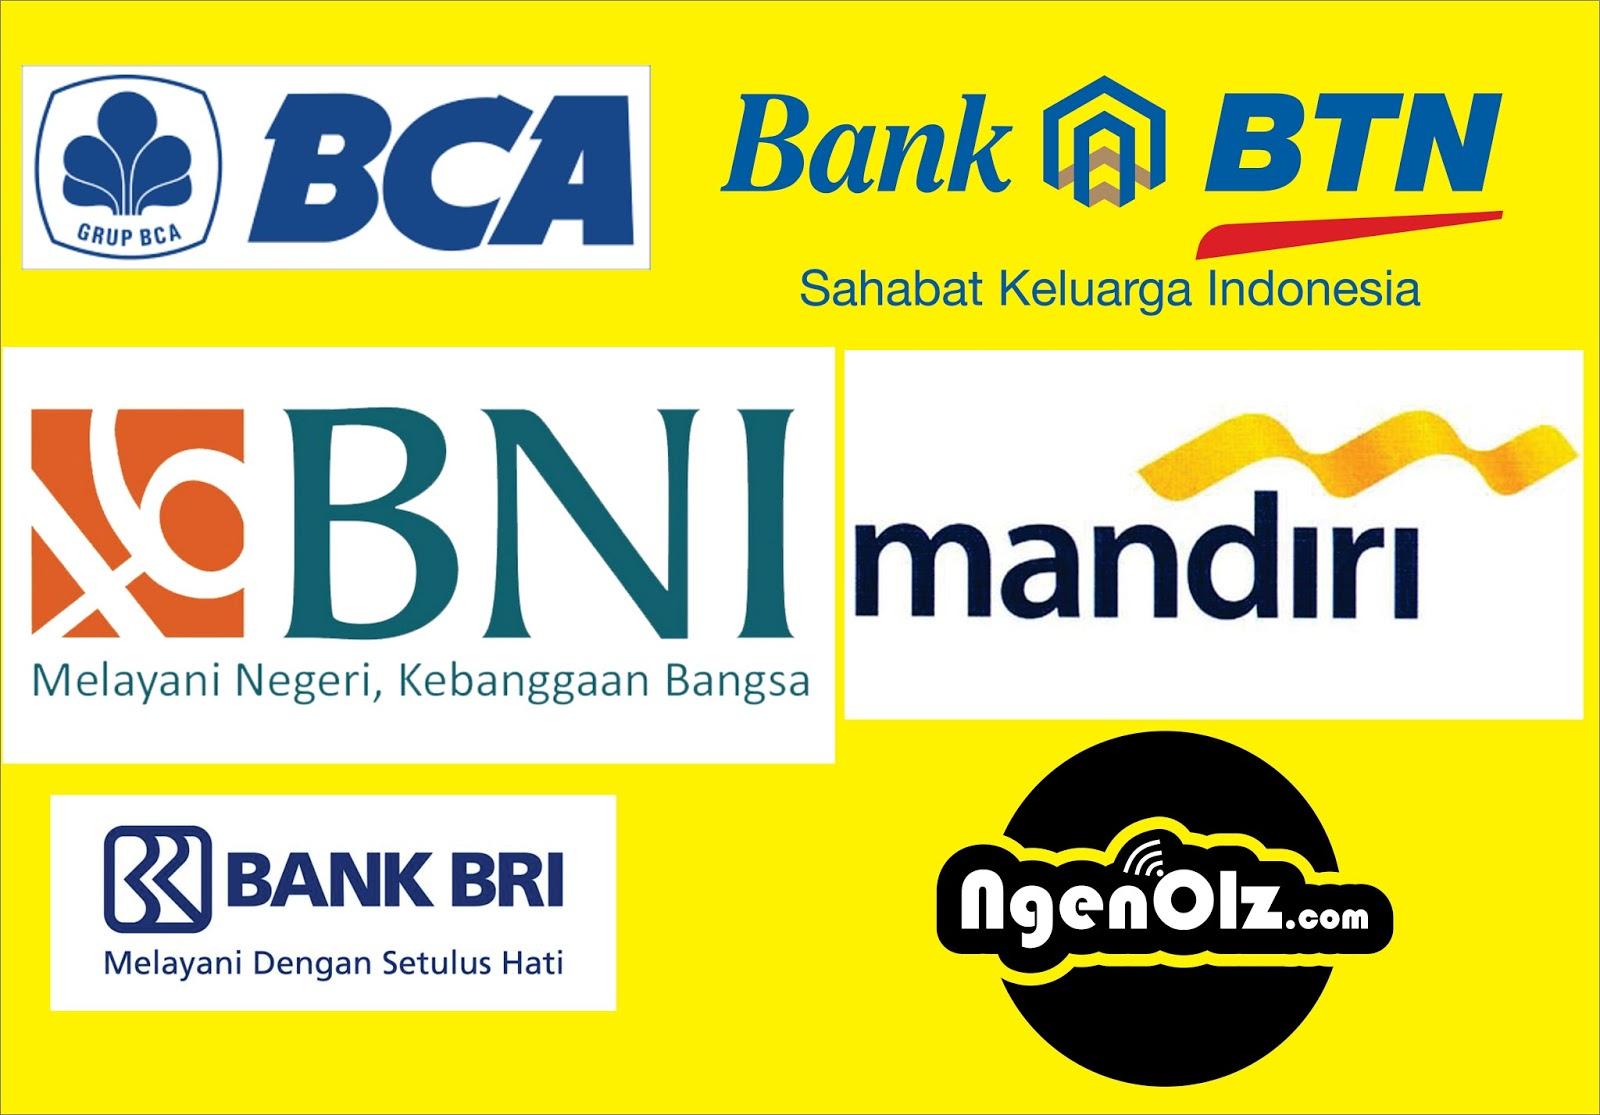 Pada Umunya Cara Pendaftaran Menjadi Nasabah Di Semua Bank Itu Sama Saja Jadi Tinggal Pilihan Ada Di Tangan Anda Mau Menjadi Nasabah Di Bank Mana